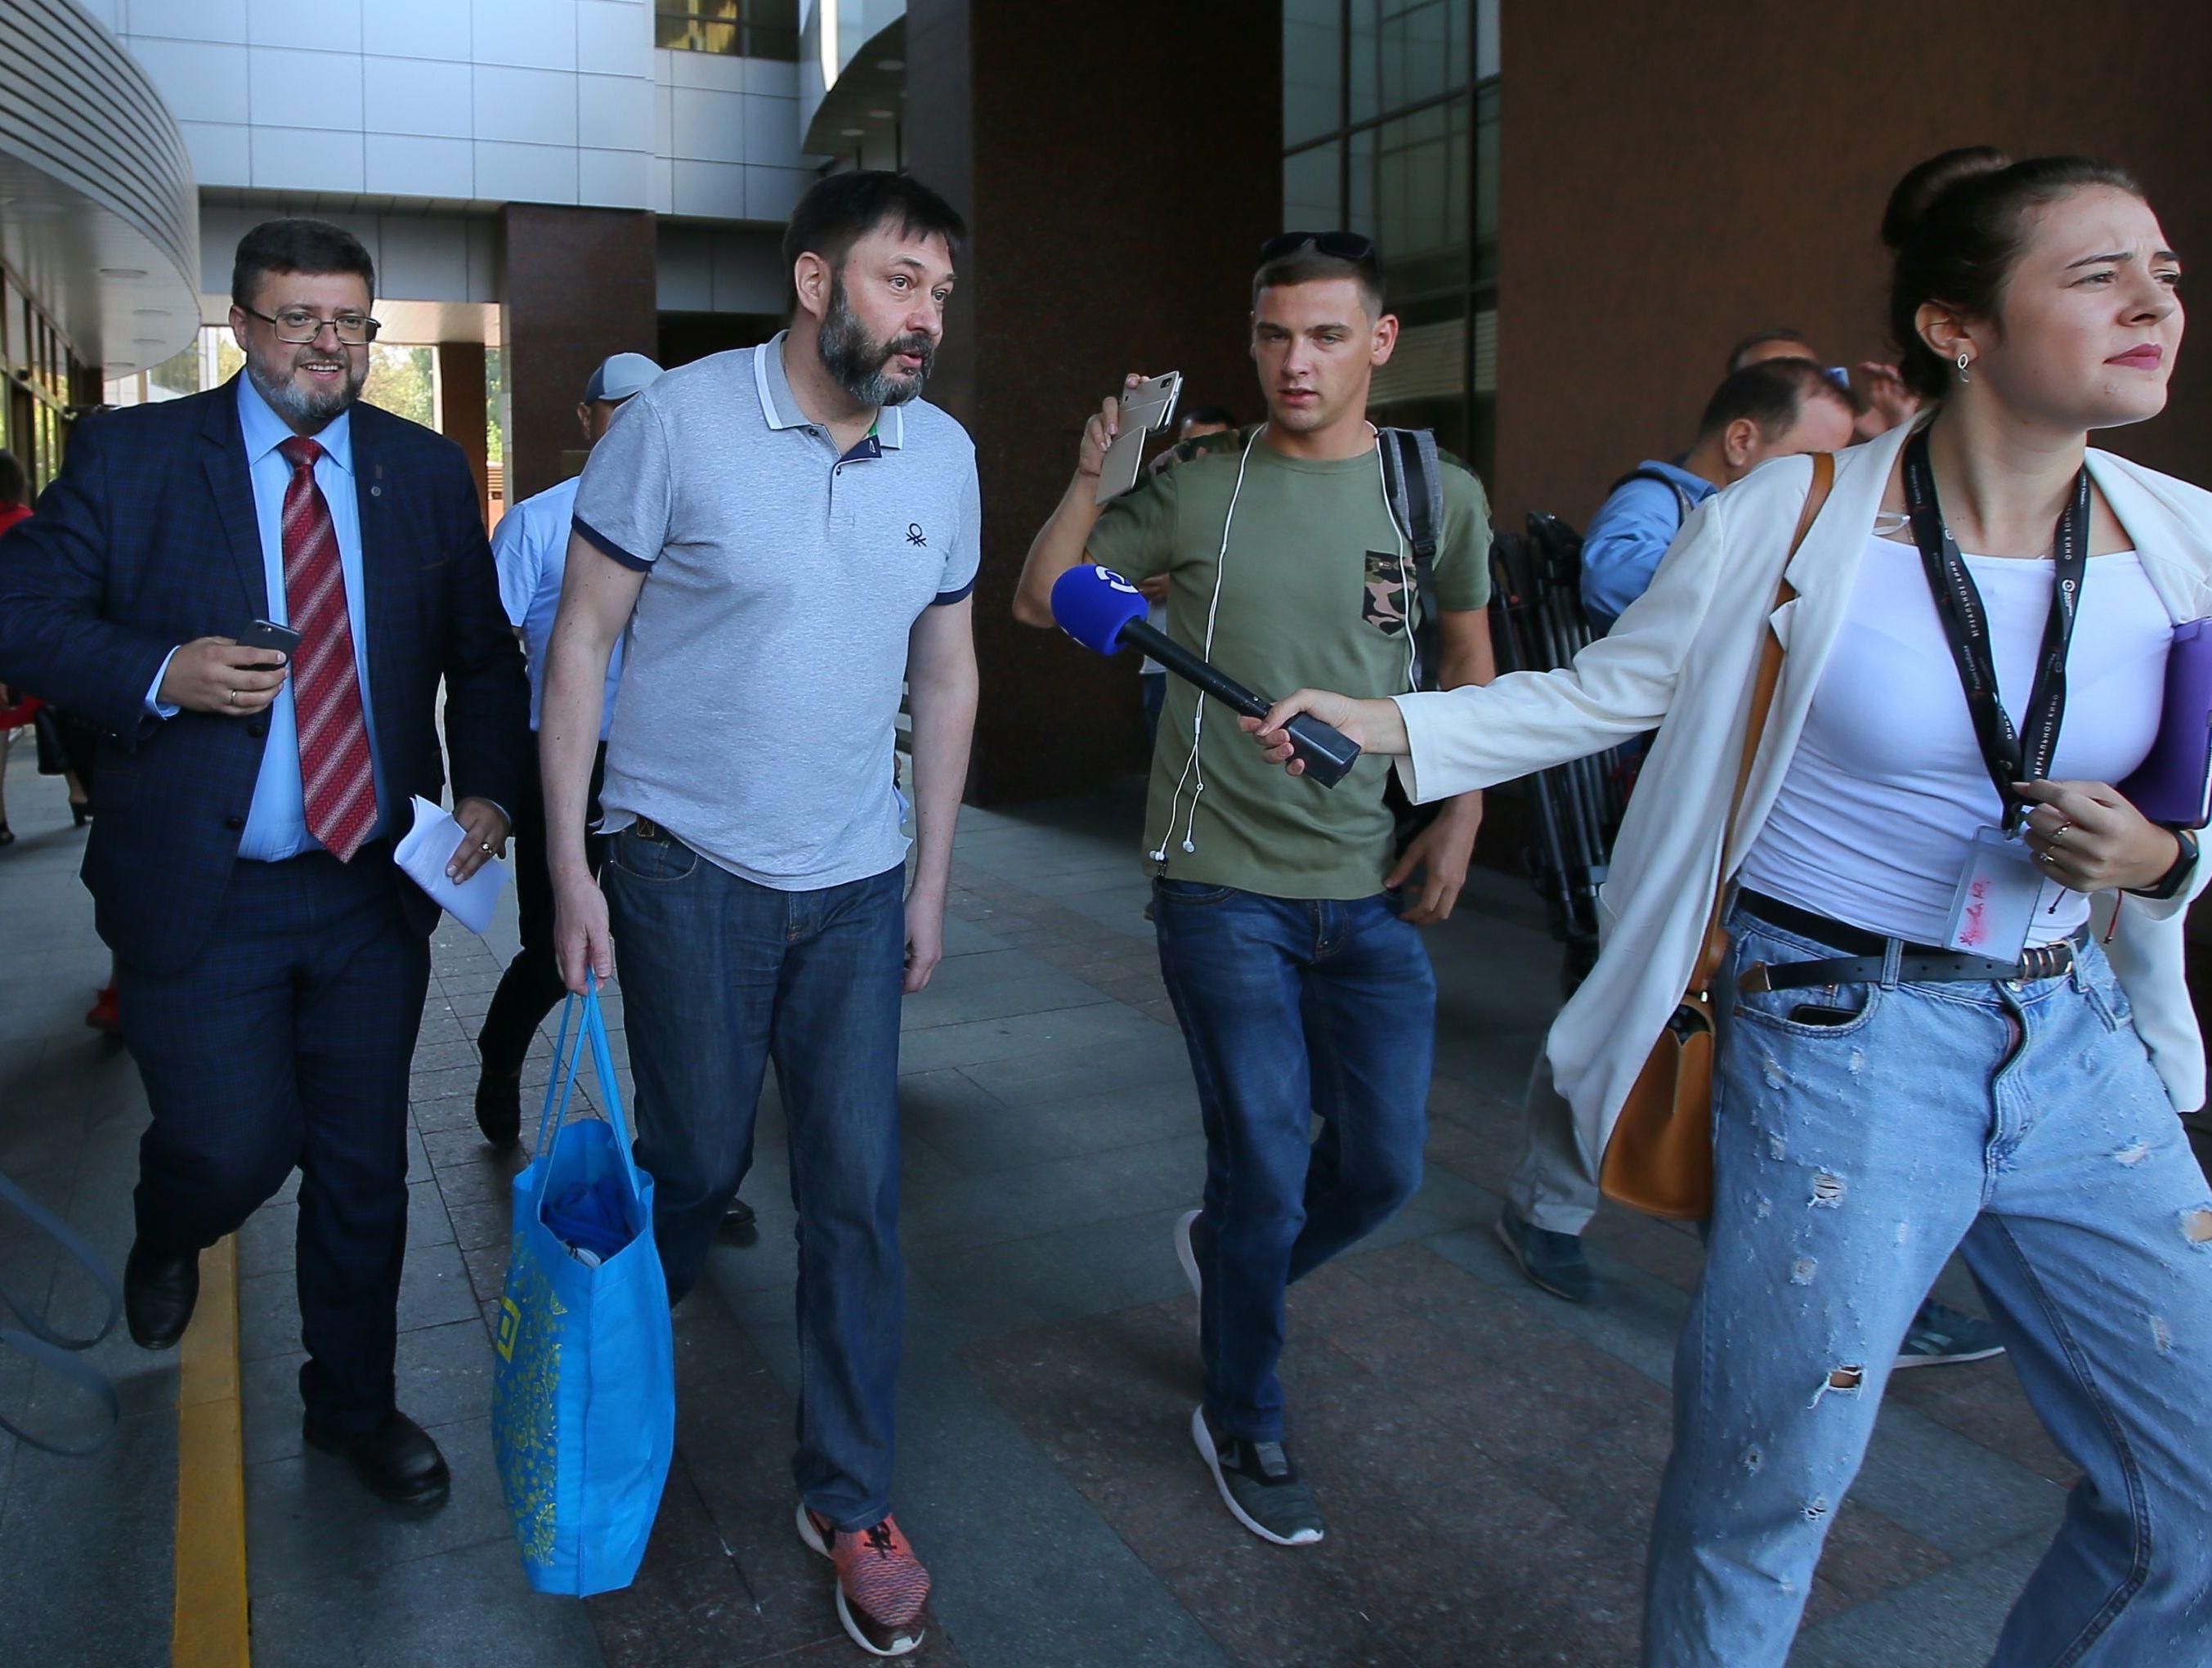 Ria Novosti Ukraine Editor-in-Chief Kirill Vyshinsky near a court building in Kiev